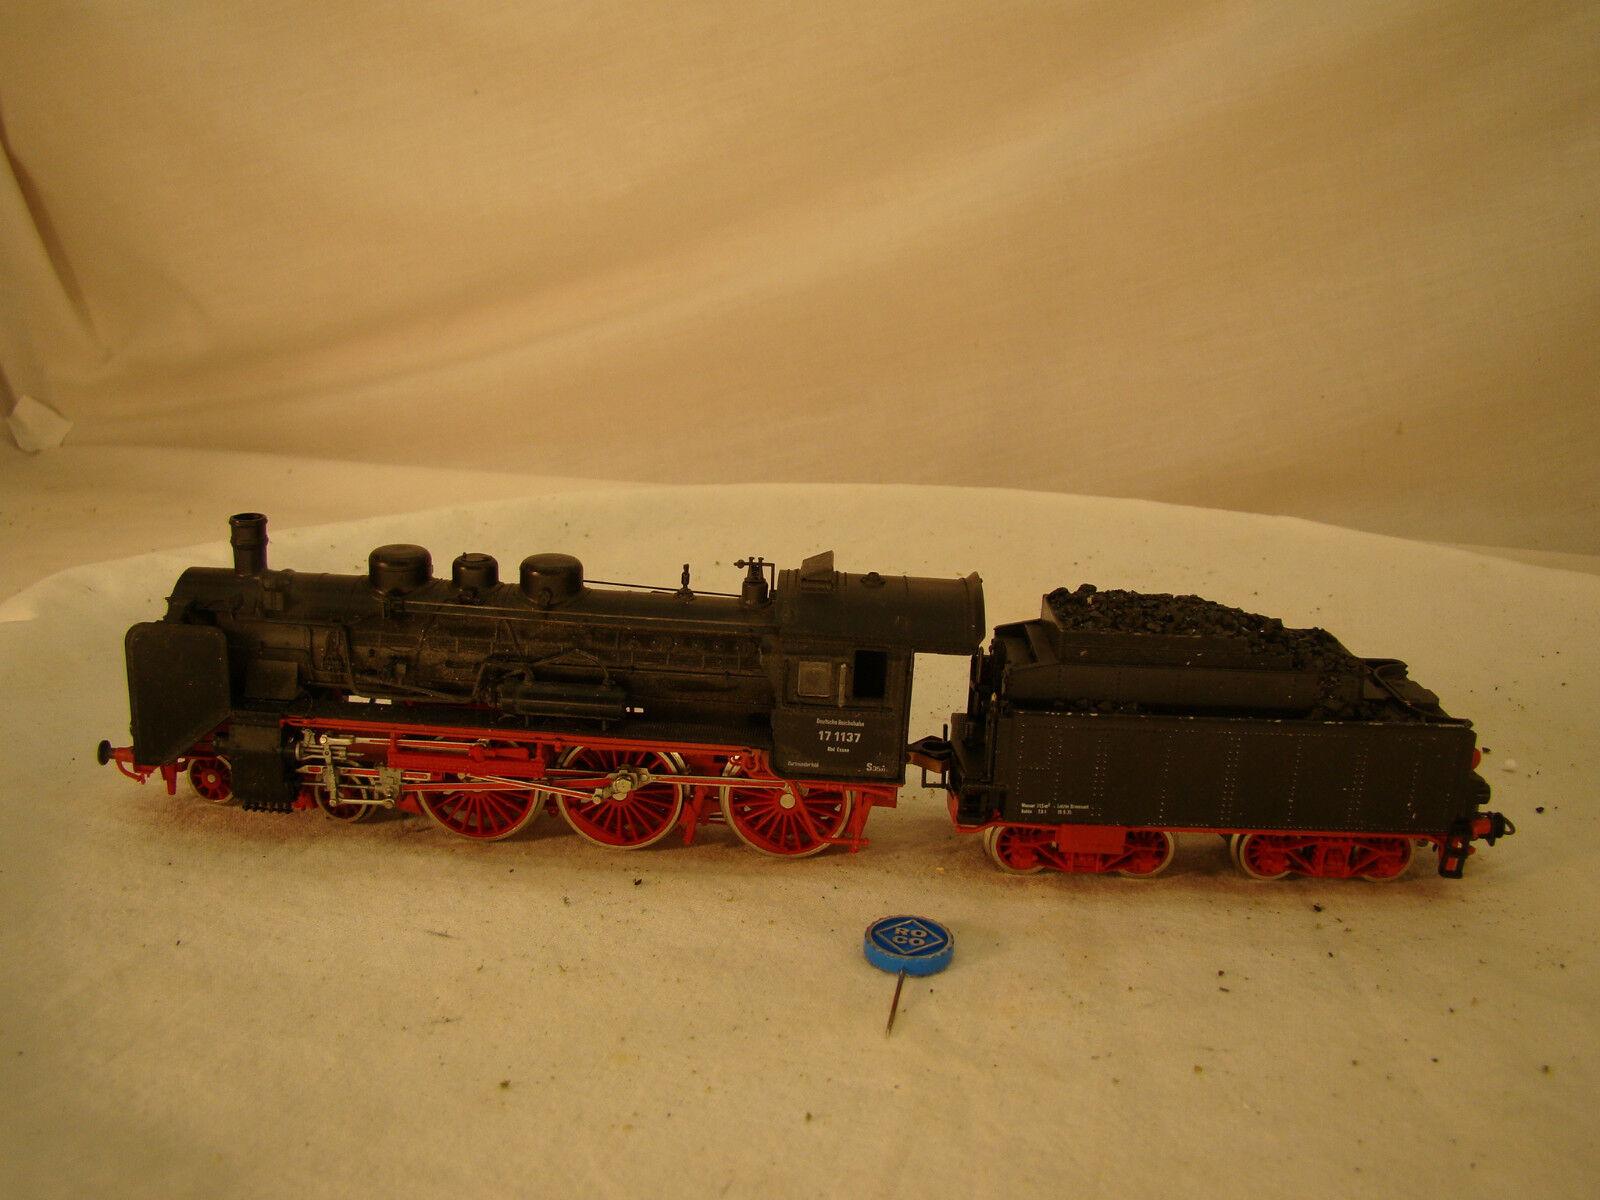 4-6-0  Roco Steam Locomotive - used for passenger trains - beautiful item - HO